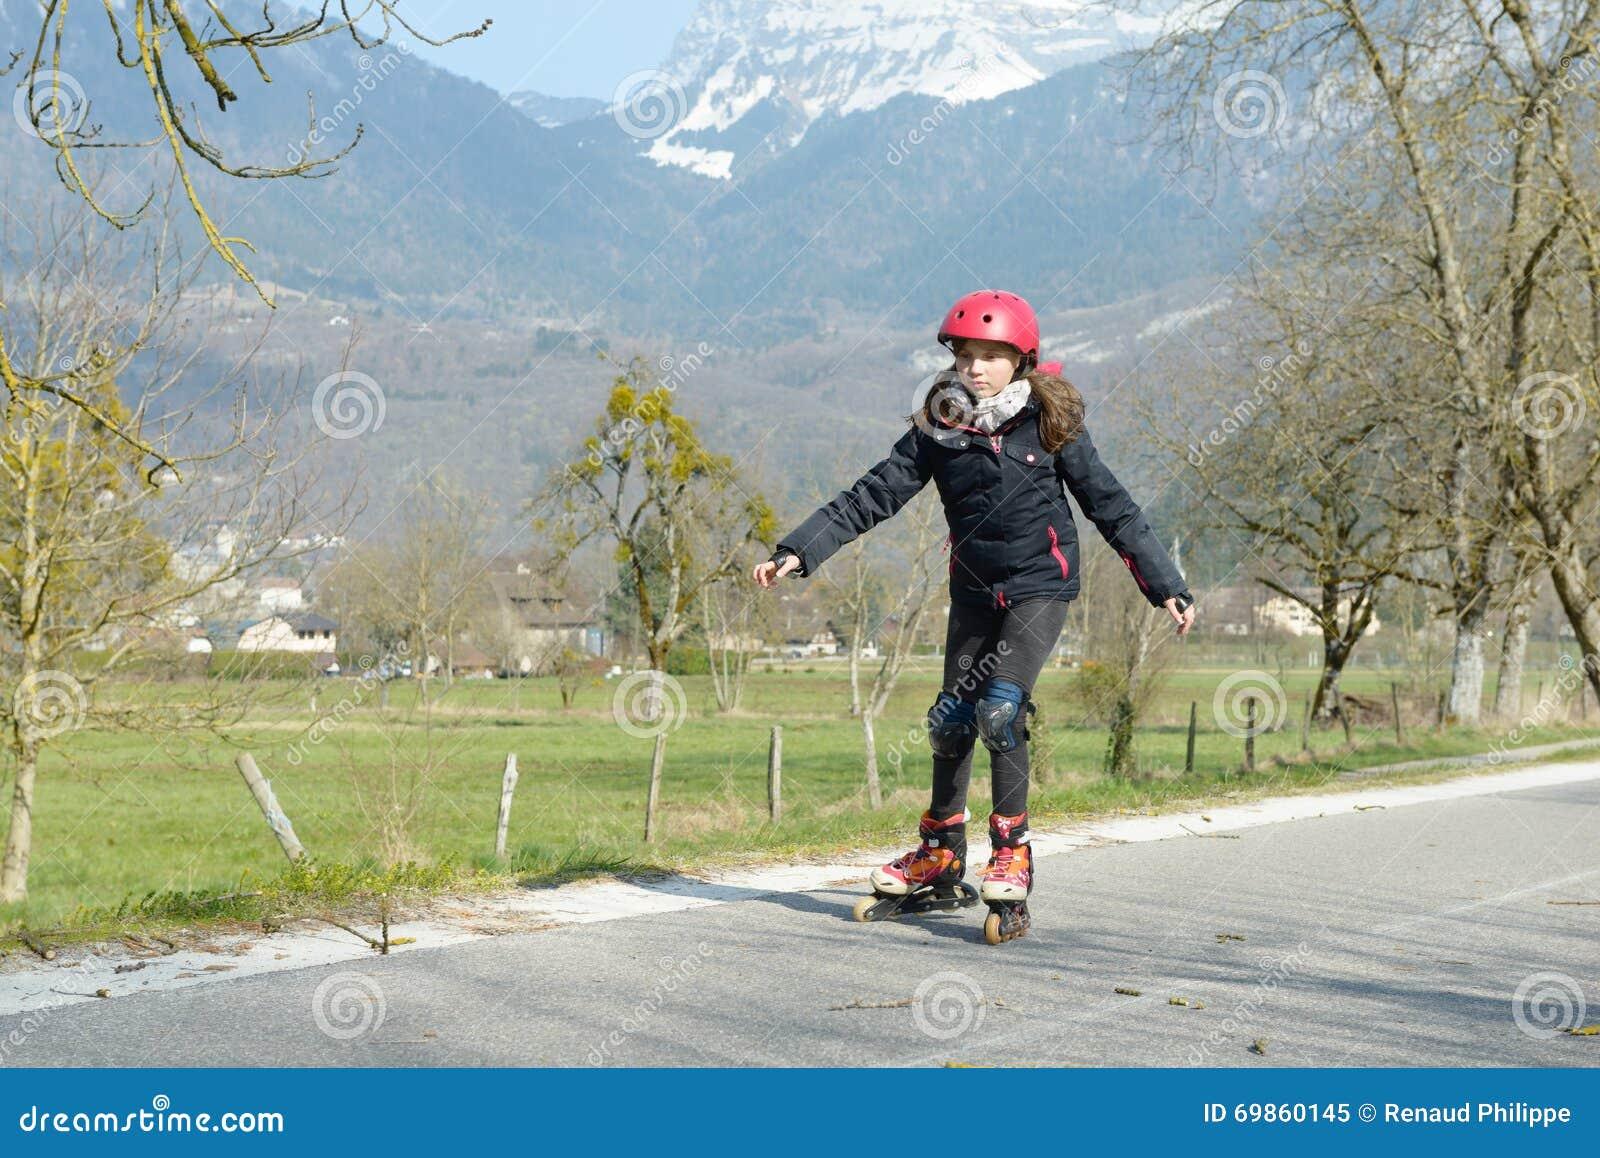 Black woman on roller skates riding outdoors on urban